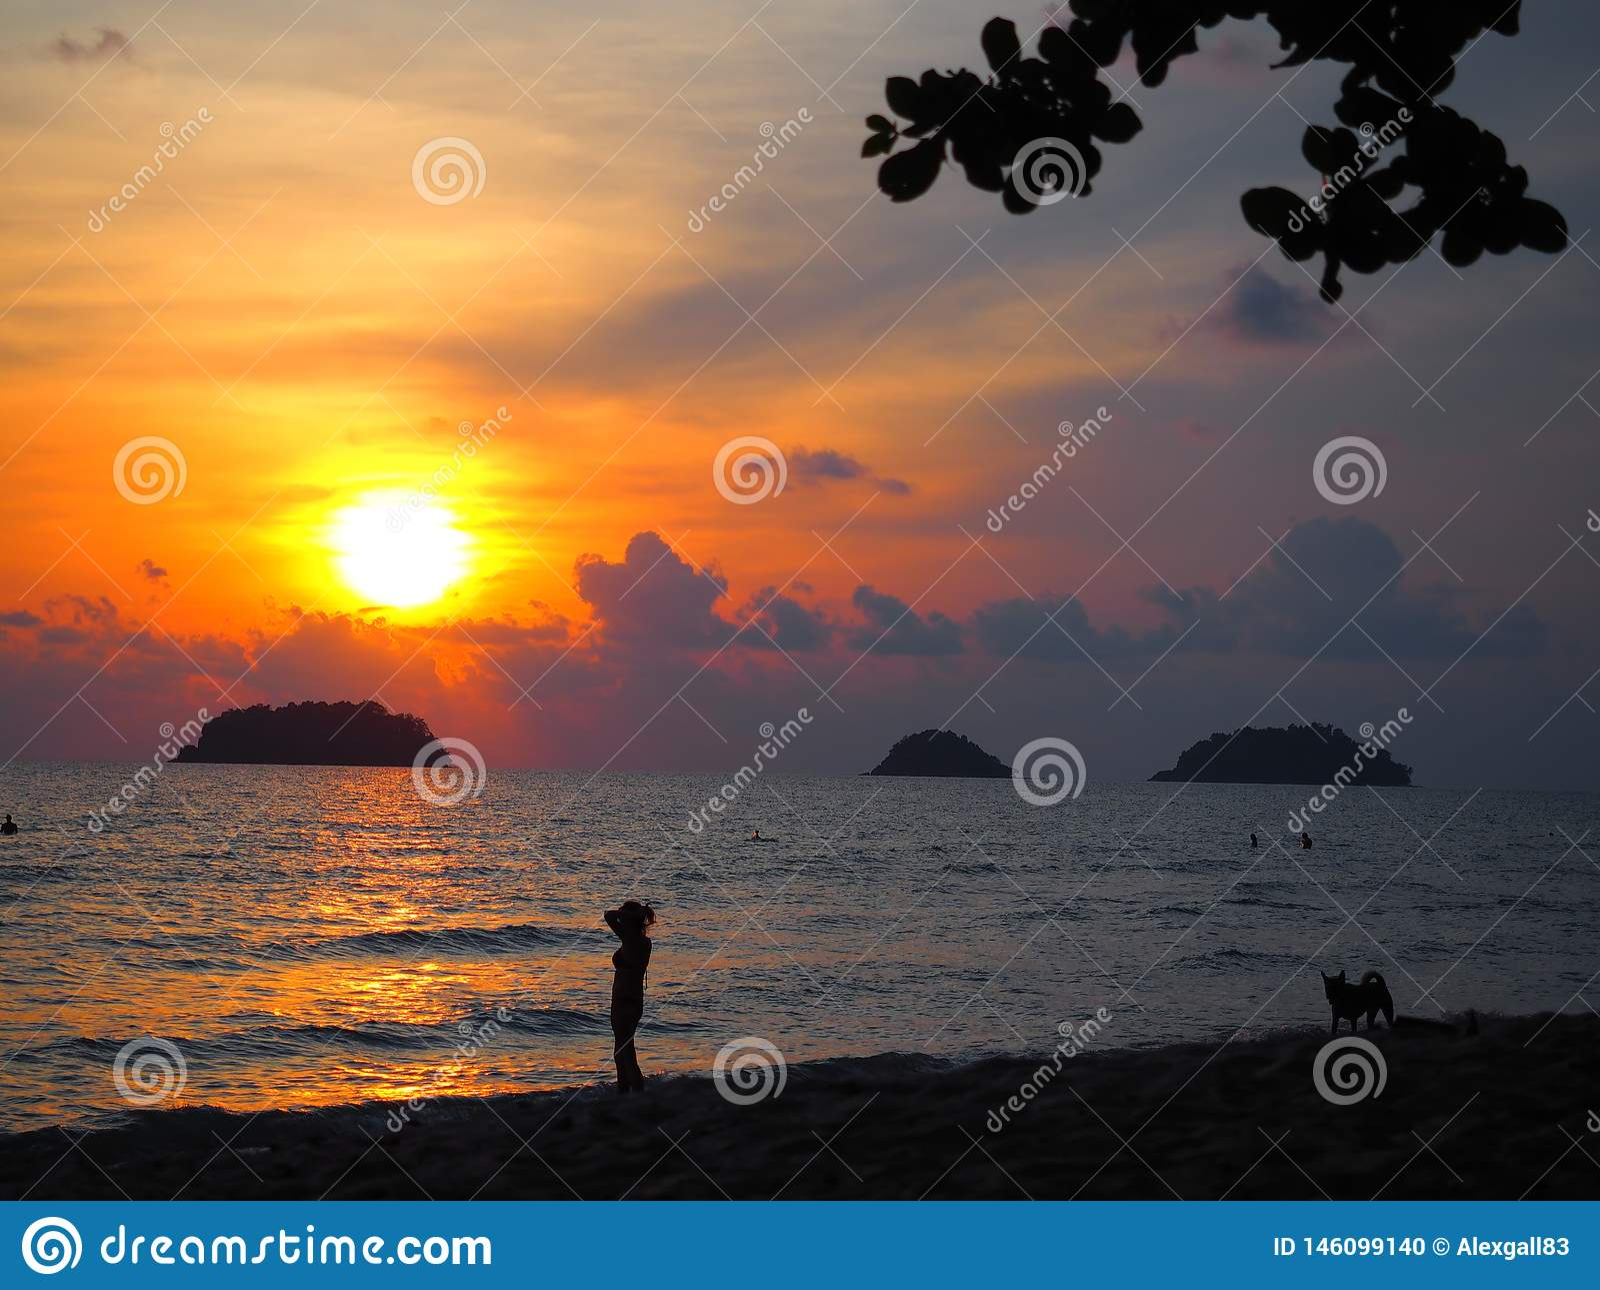 изумляя заход солнца в Ko Chang остров на юге Таиланда, близко к камбоджийской границе